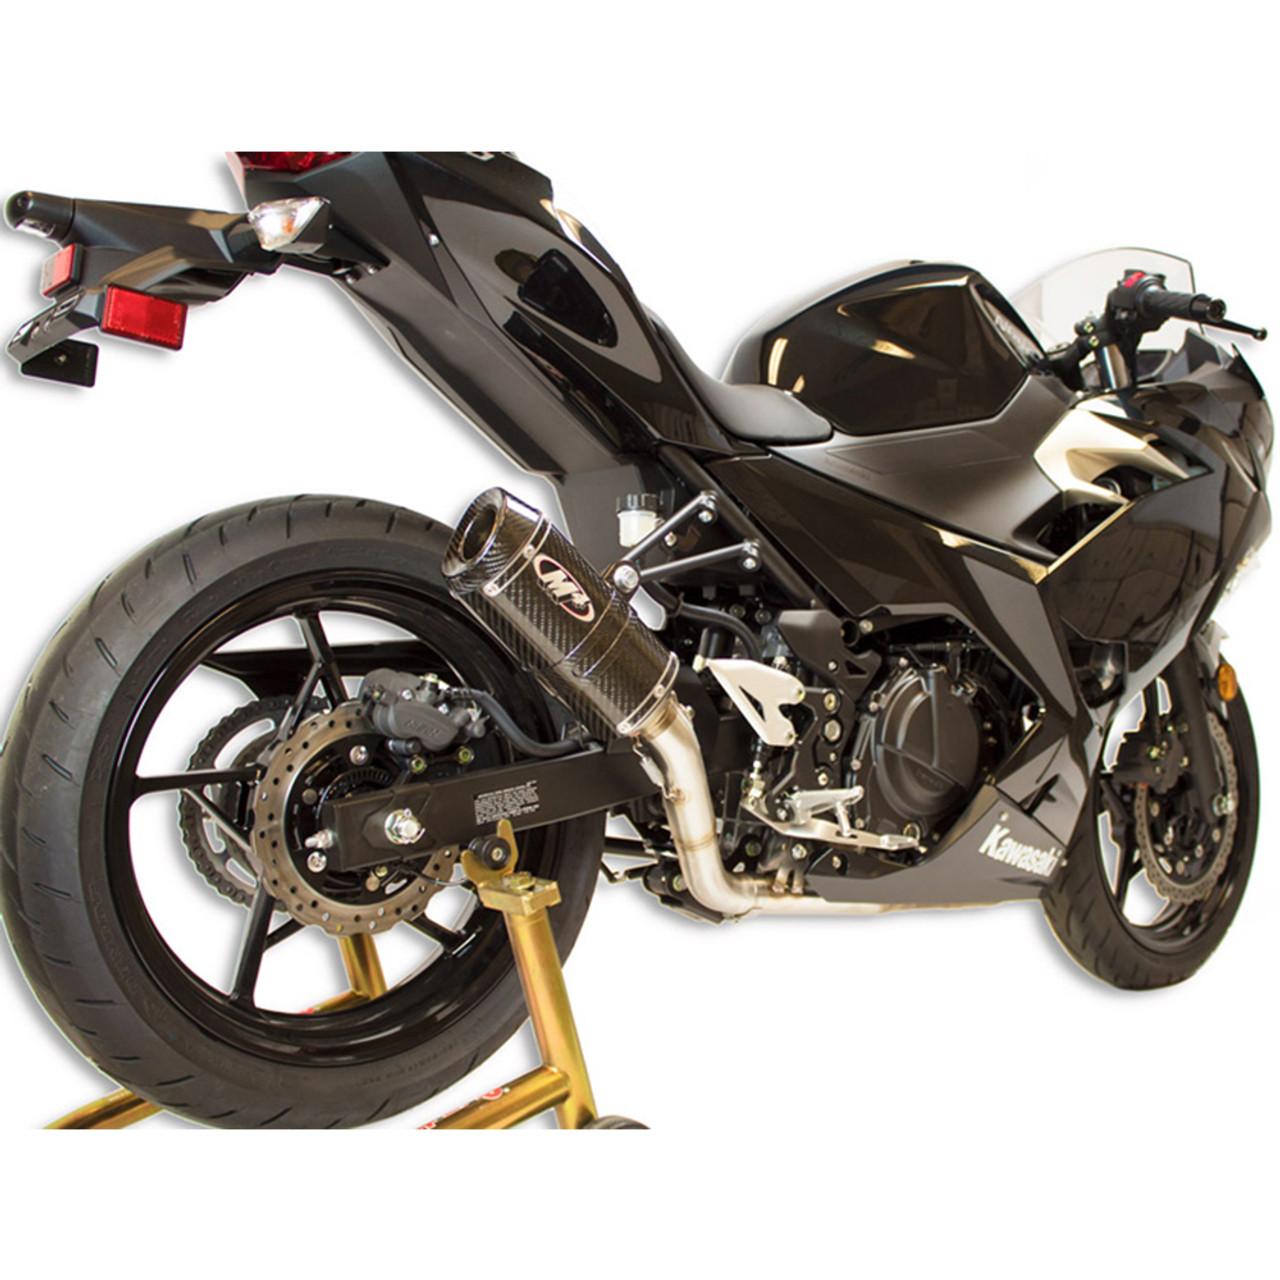 Brand new motorcycle exhaust mid-pipe with exhaust muffler for kawasaki Ninja400 2018